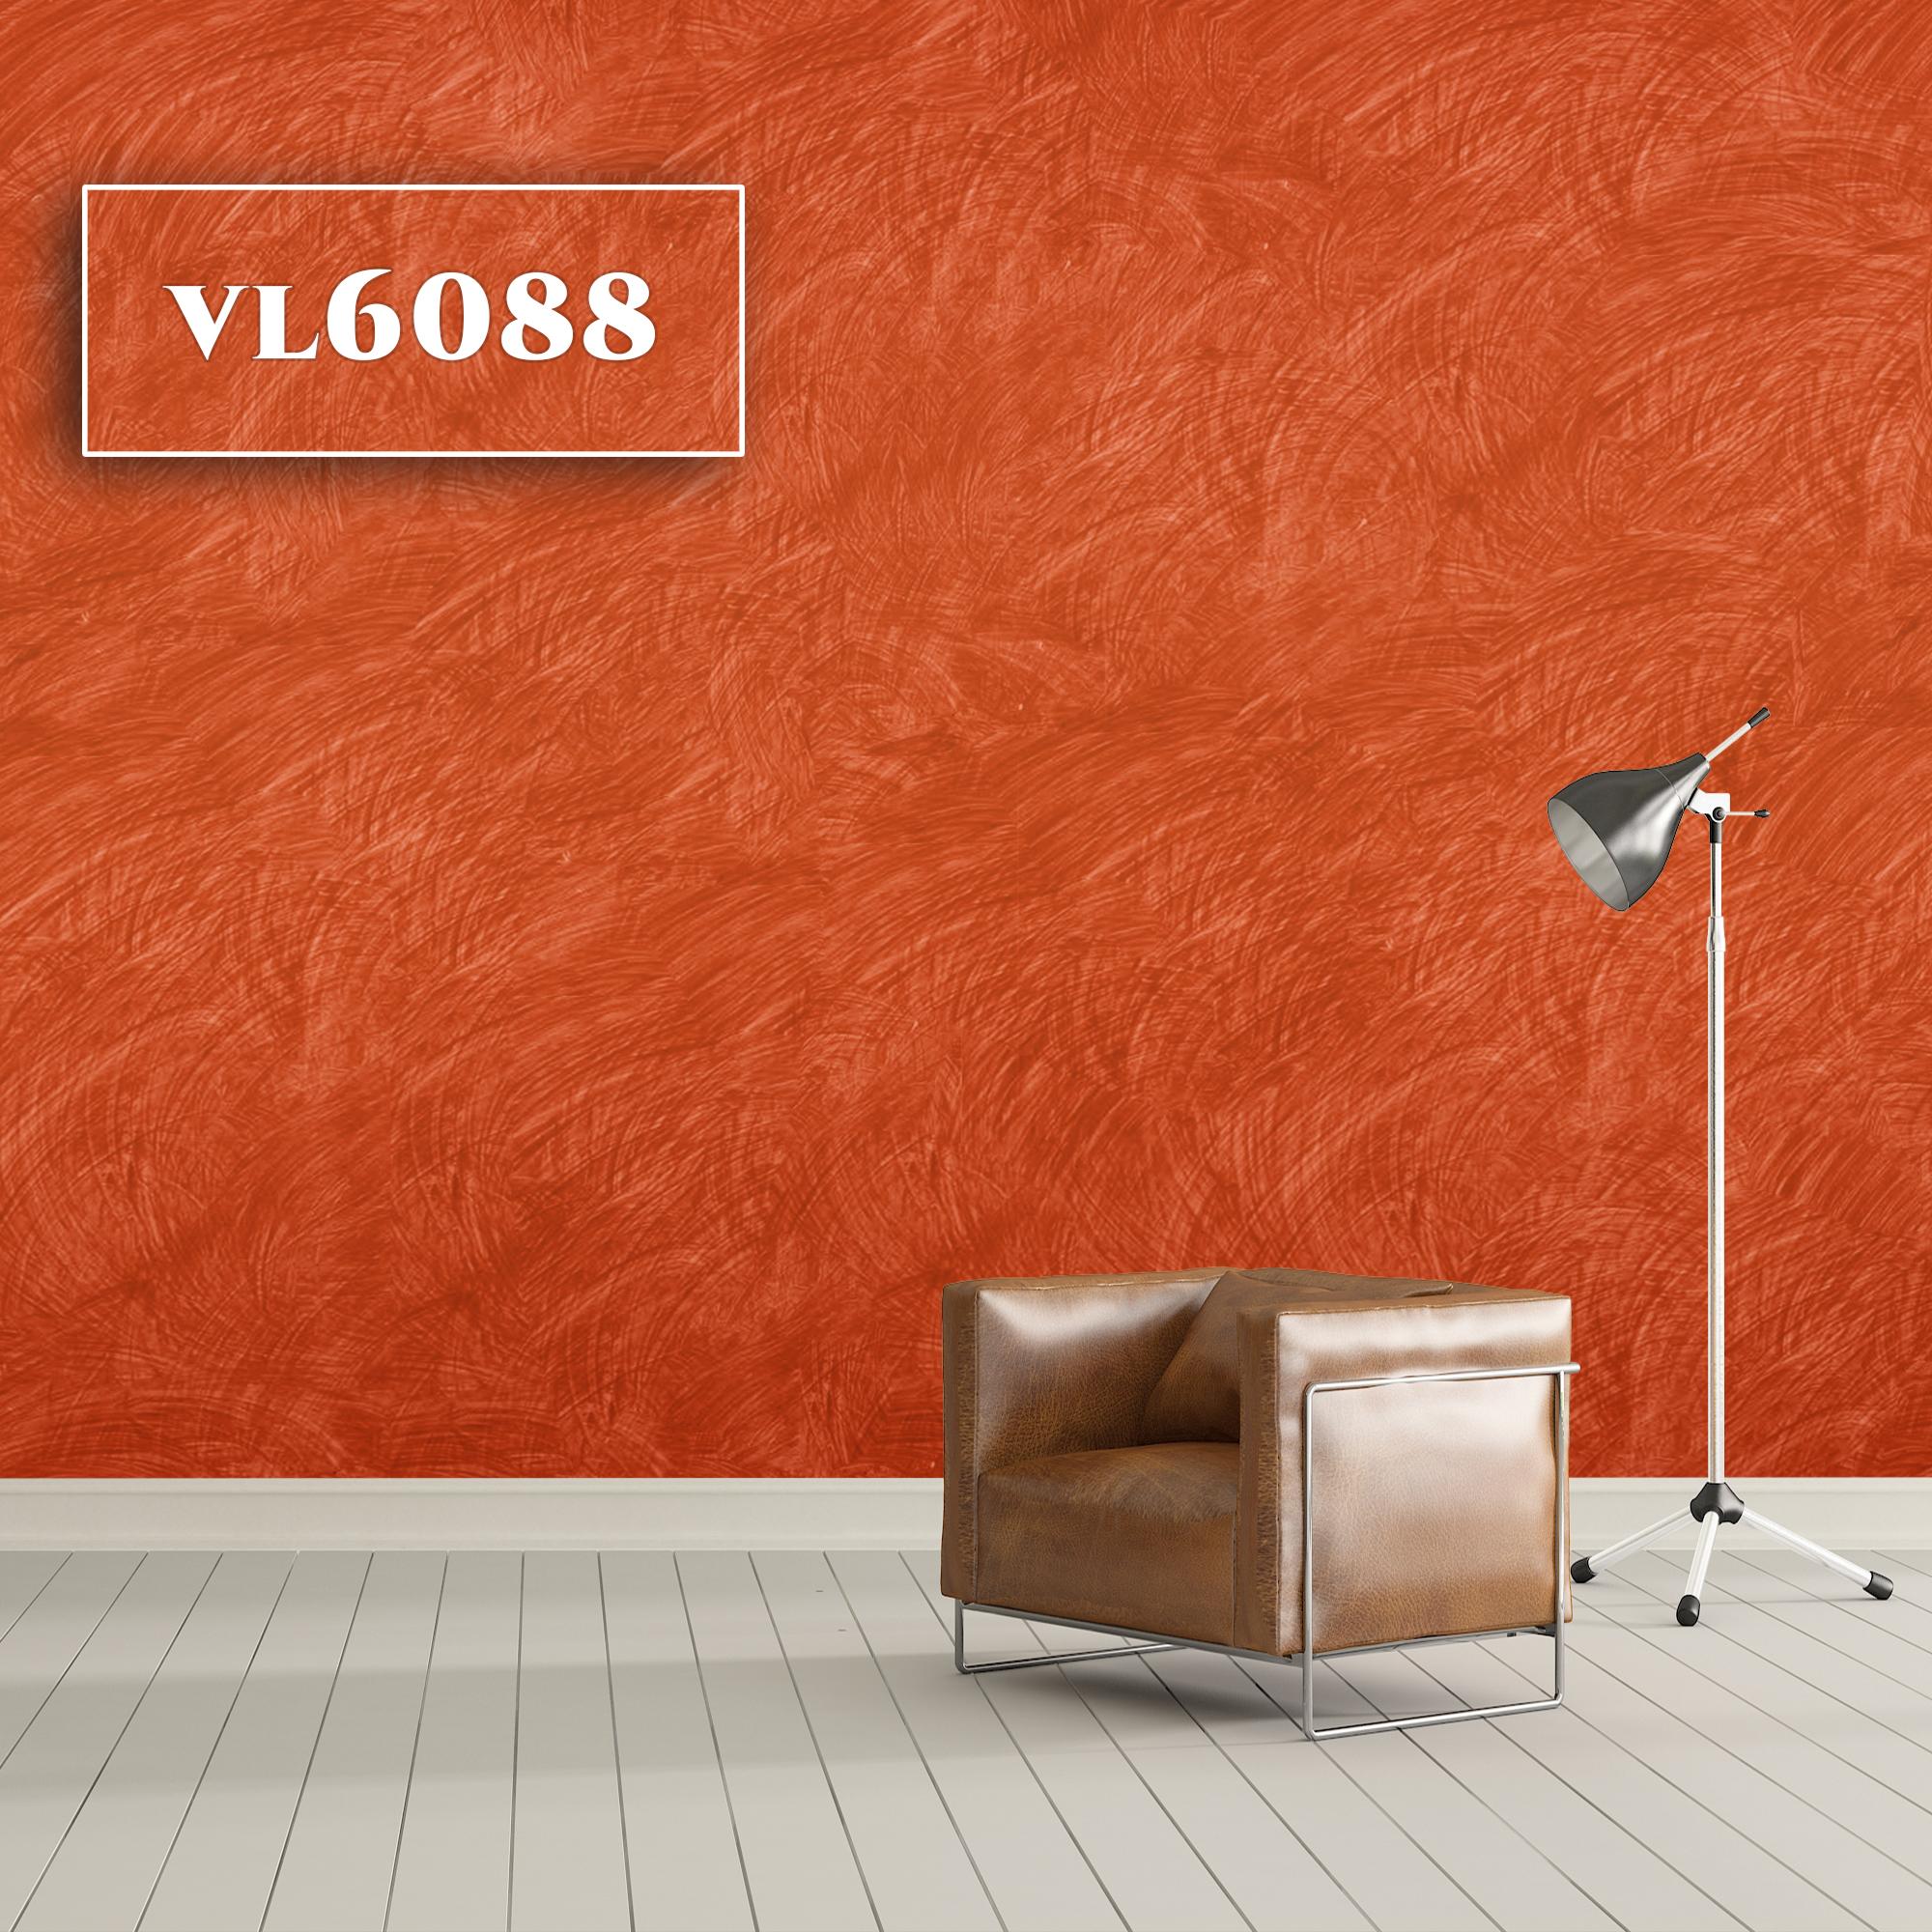 VL6088